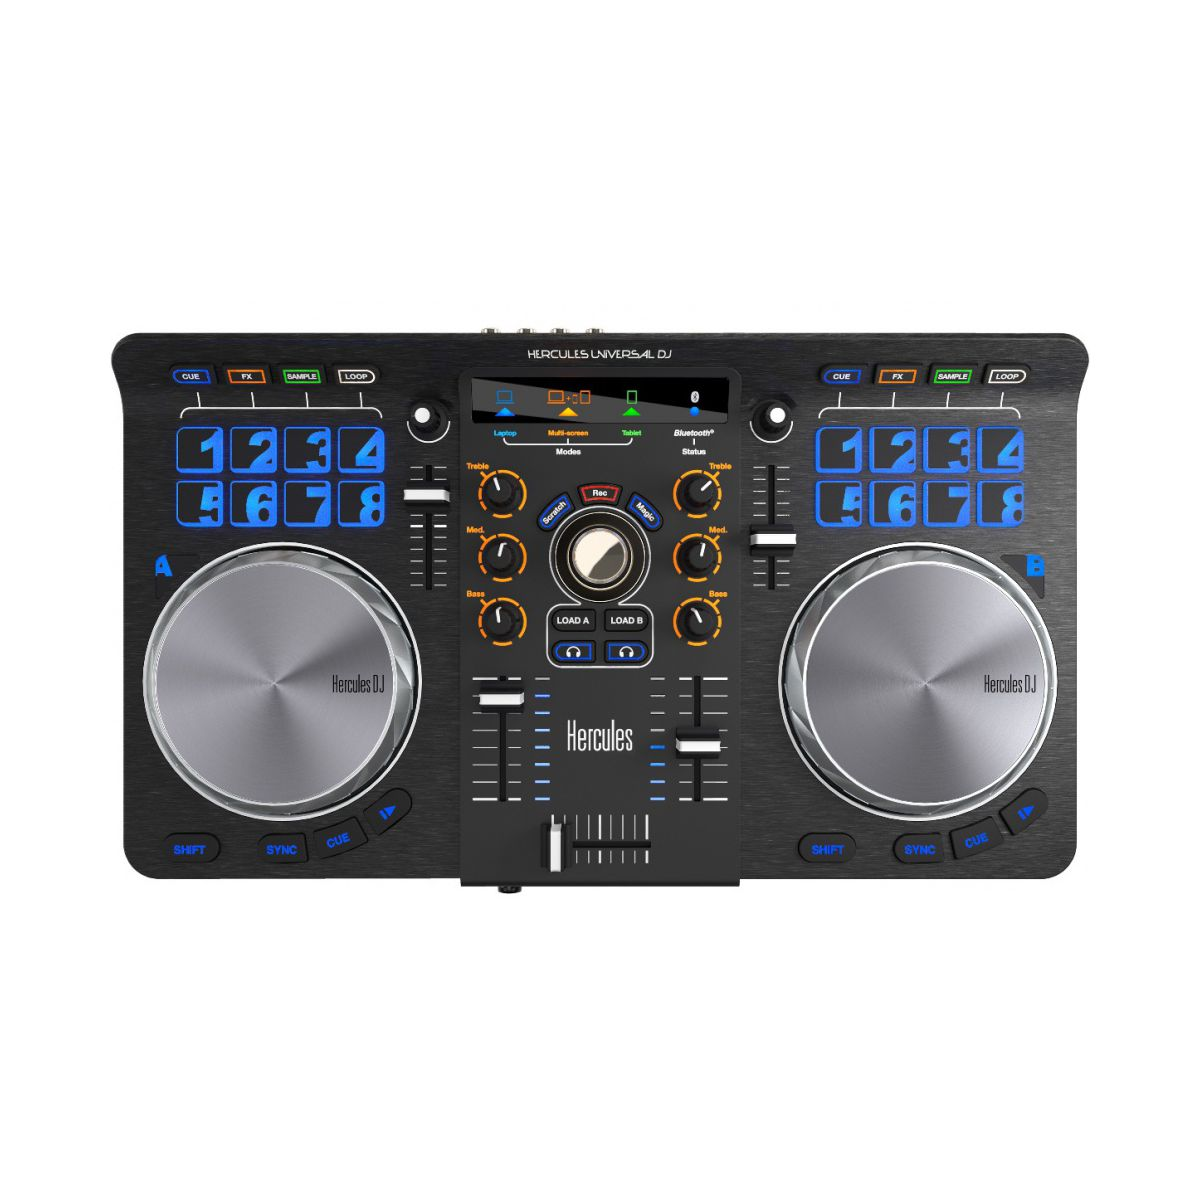 Table Mixage HERCULES UNIVERSAL DJ (photo)